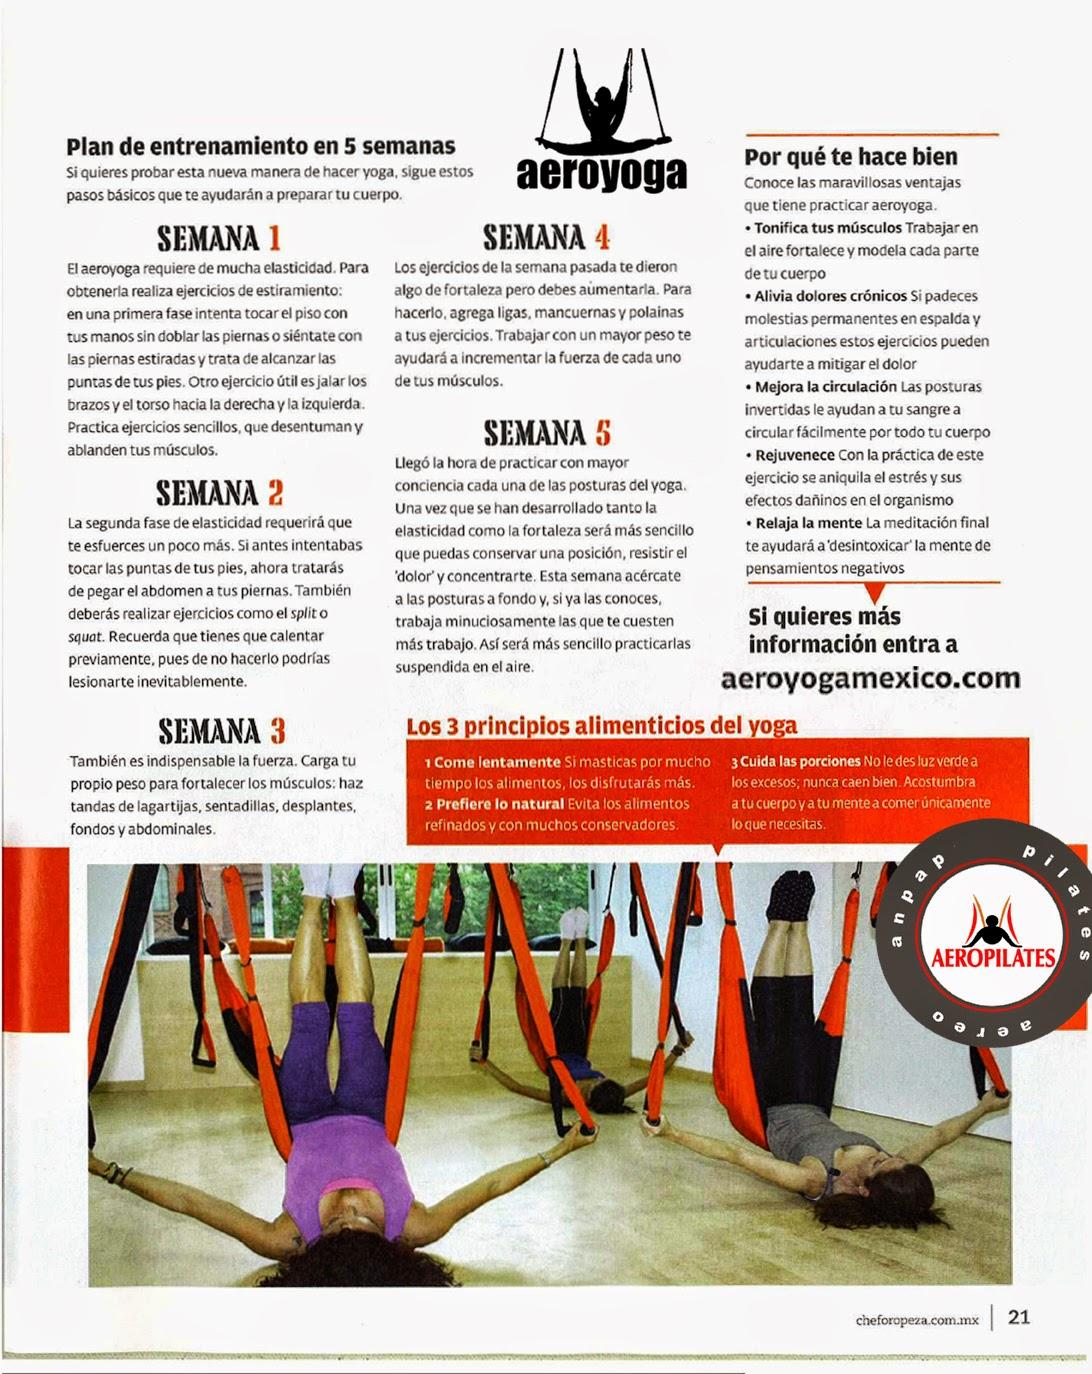 AeroYOga® Yoga Aerien Presse et Télévision  PILATES AEREO, AERO YOGA AEREO PRENSA Y TV, TENDENCIAS, REPORTAJES, ARTICULOS